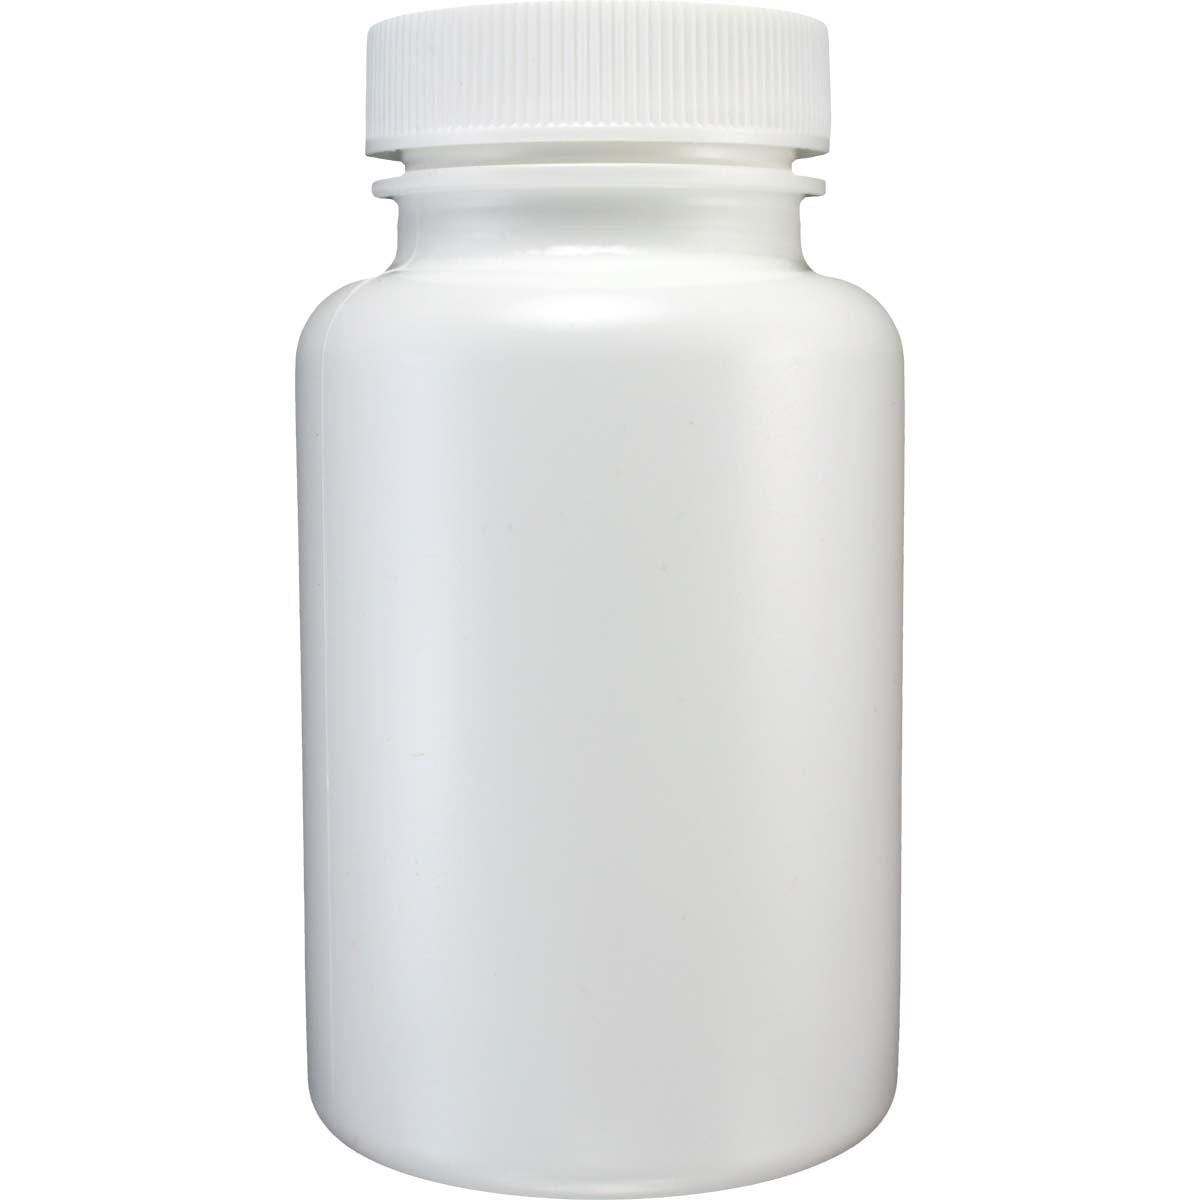 Empty Bottles Hdpe Bottles White Plastic 3oz Size